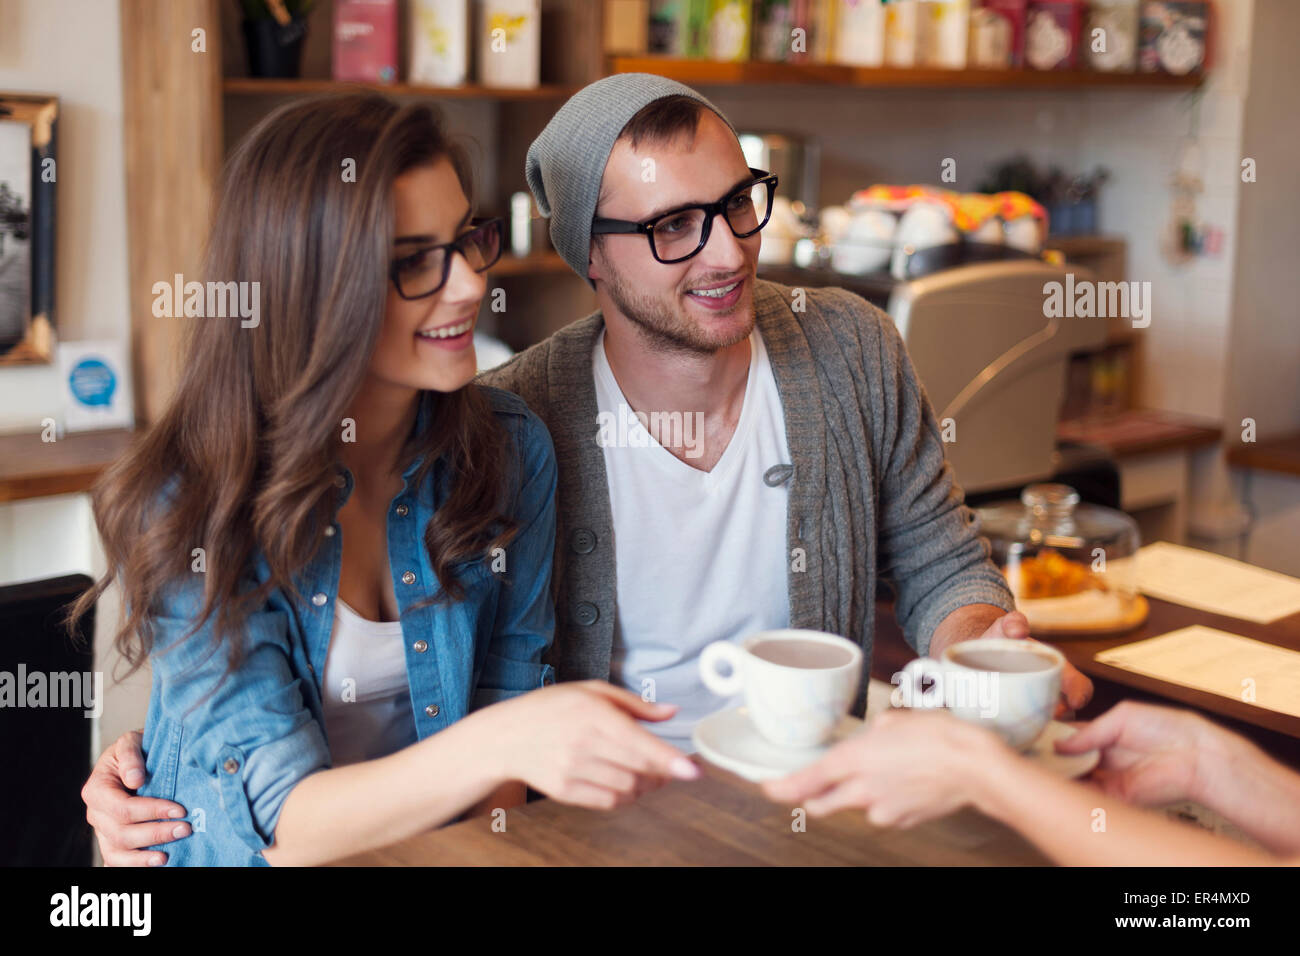 Moda par recibir café de camarera. Cracovia, Polonia Imagen De Stock